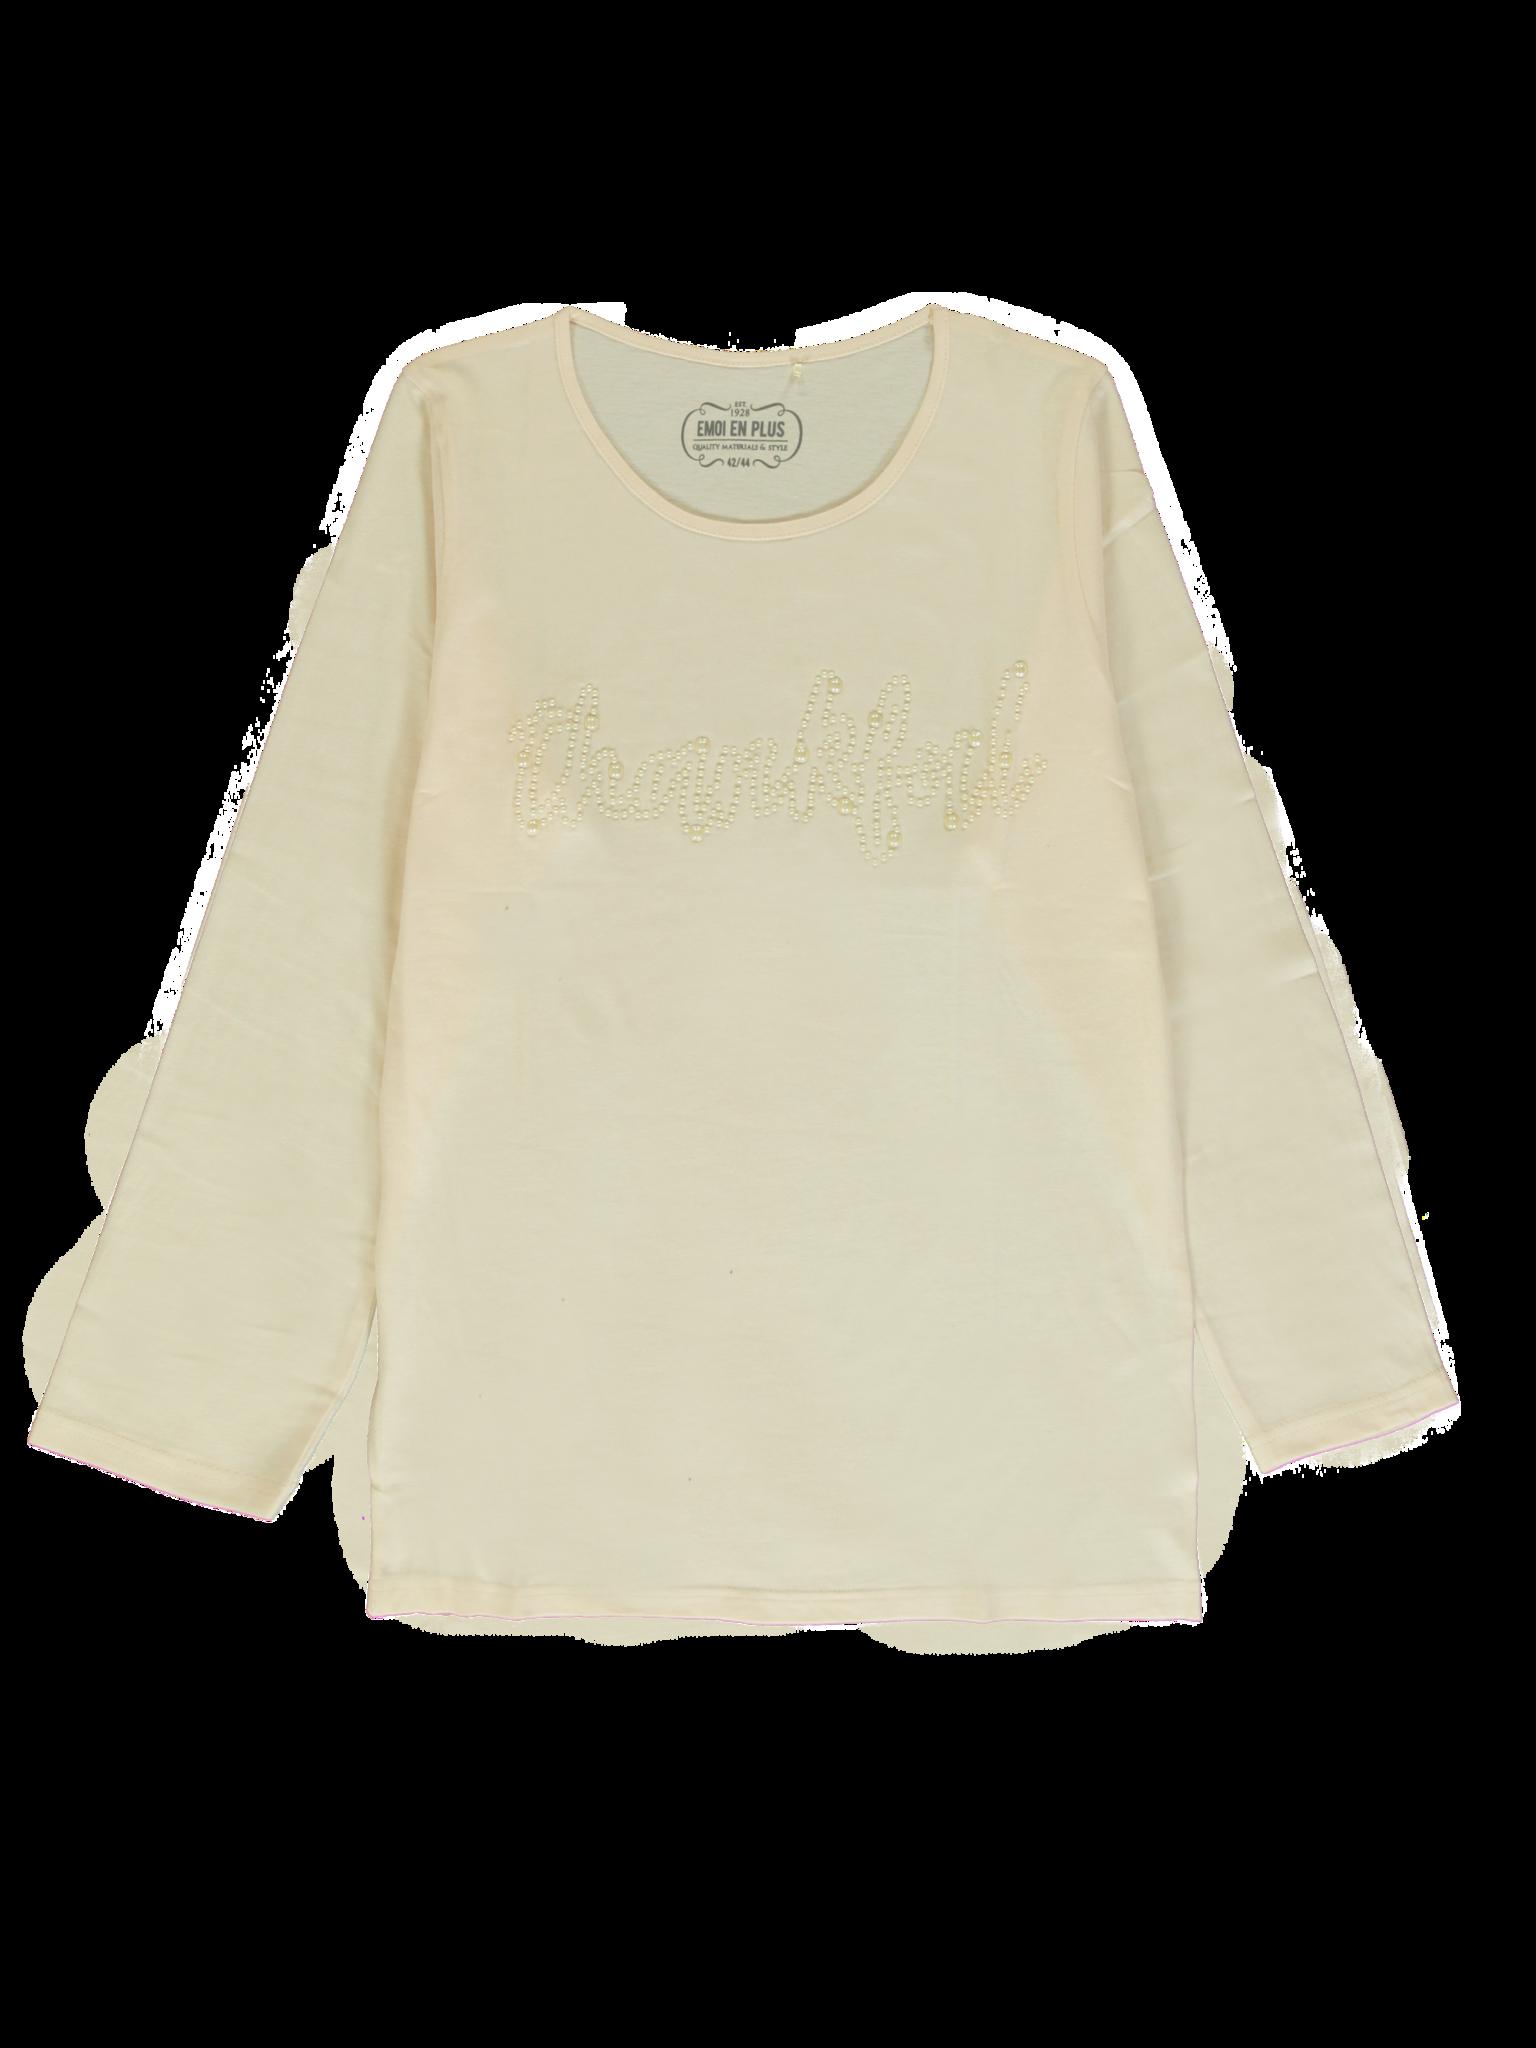 All Brands | Winterproducts Ladies+ | T-shirt | 24 pcs/box